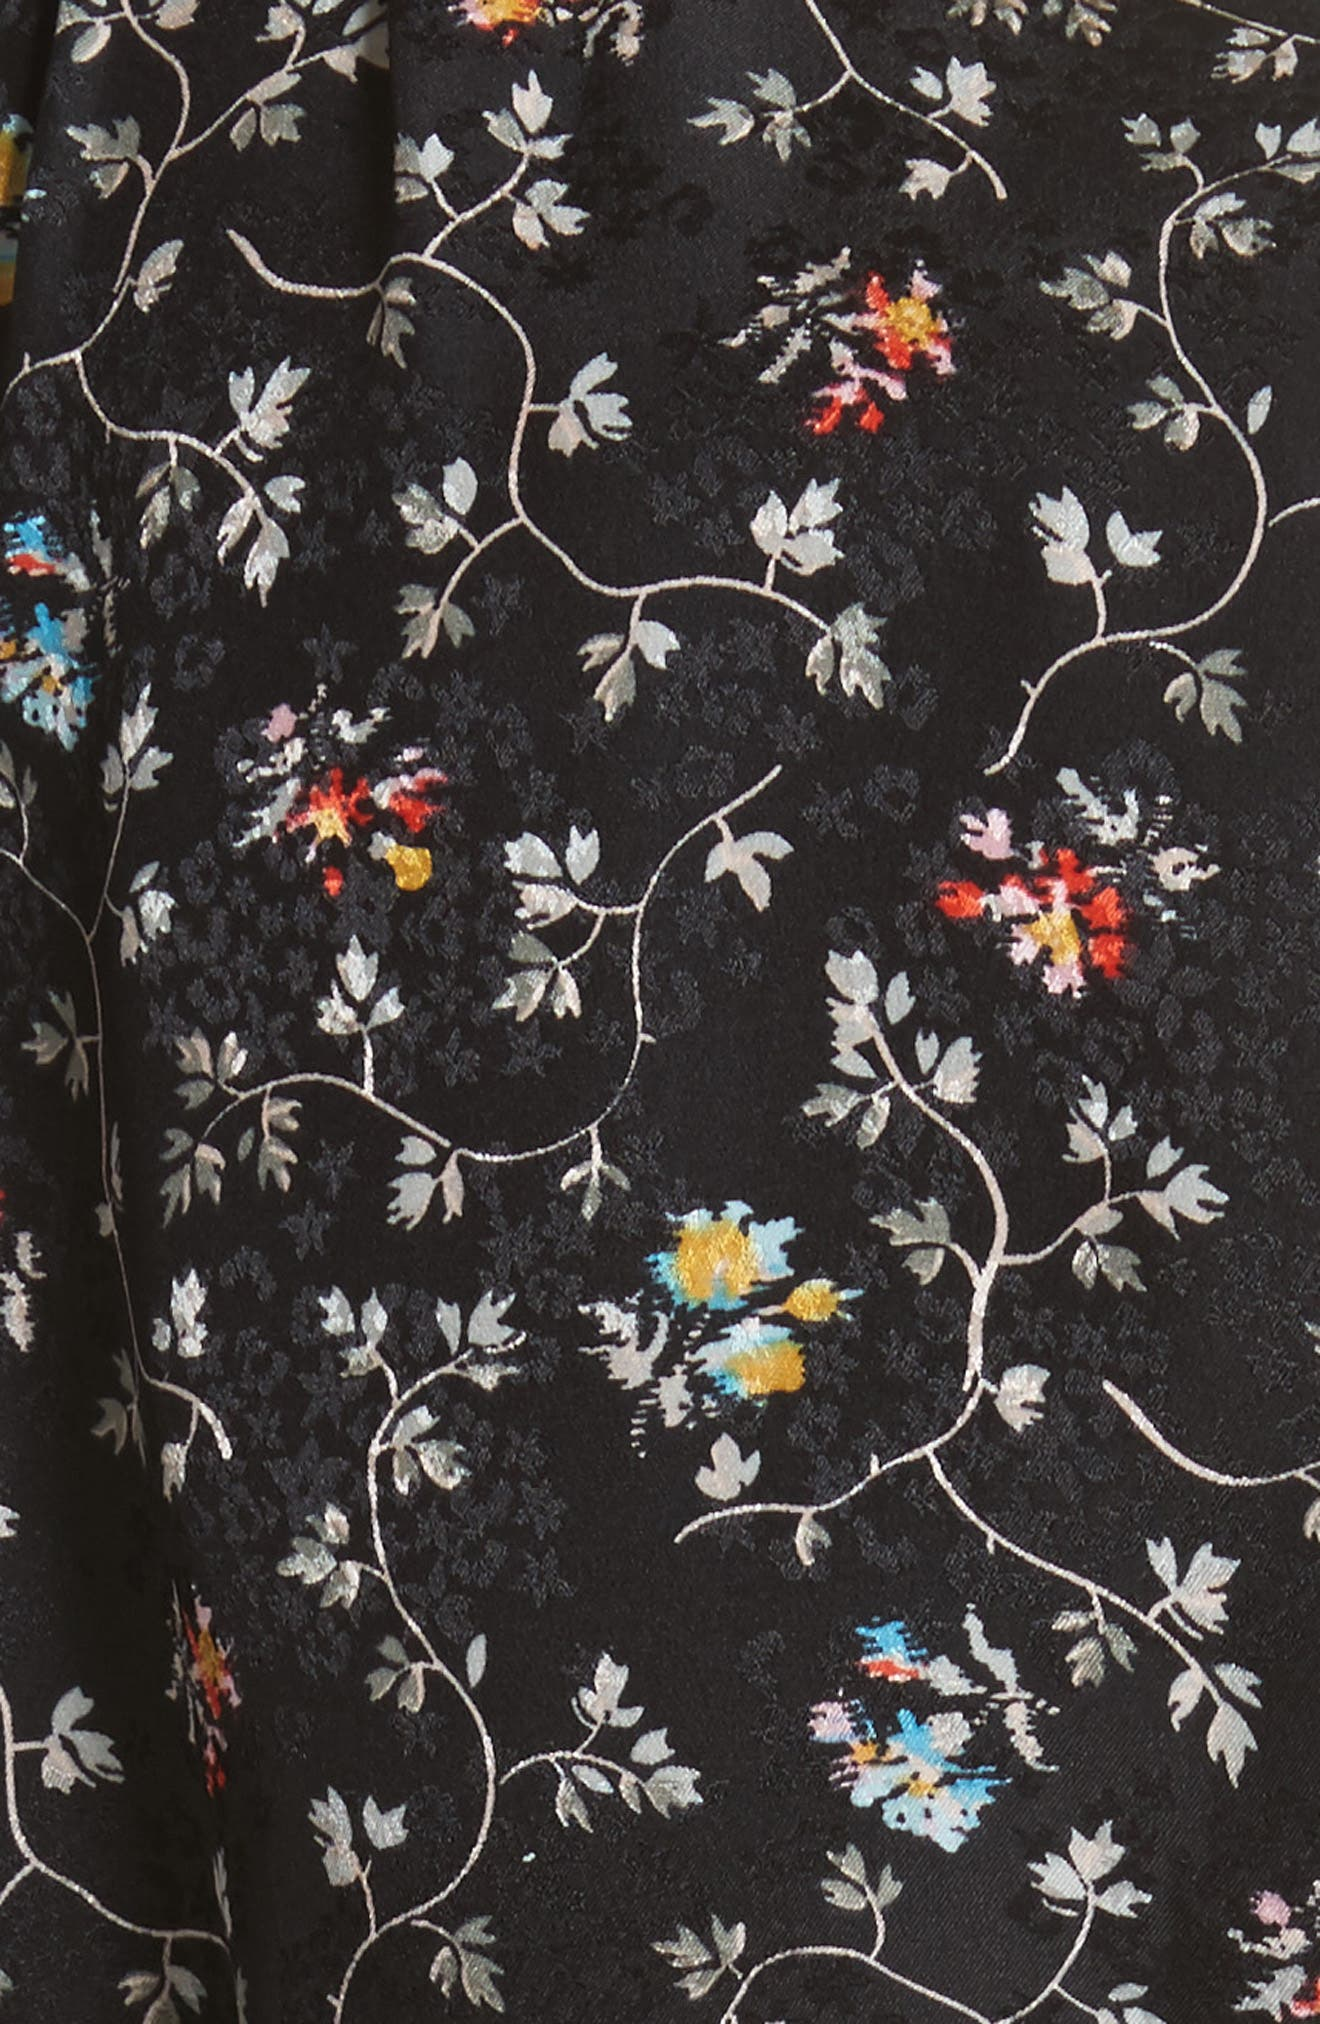 Floral Vine Silk Shirtdress,                             Alternate thumbnail 5, color,                             Black Vine Print